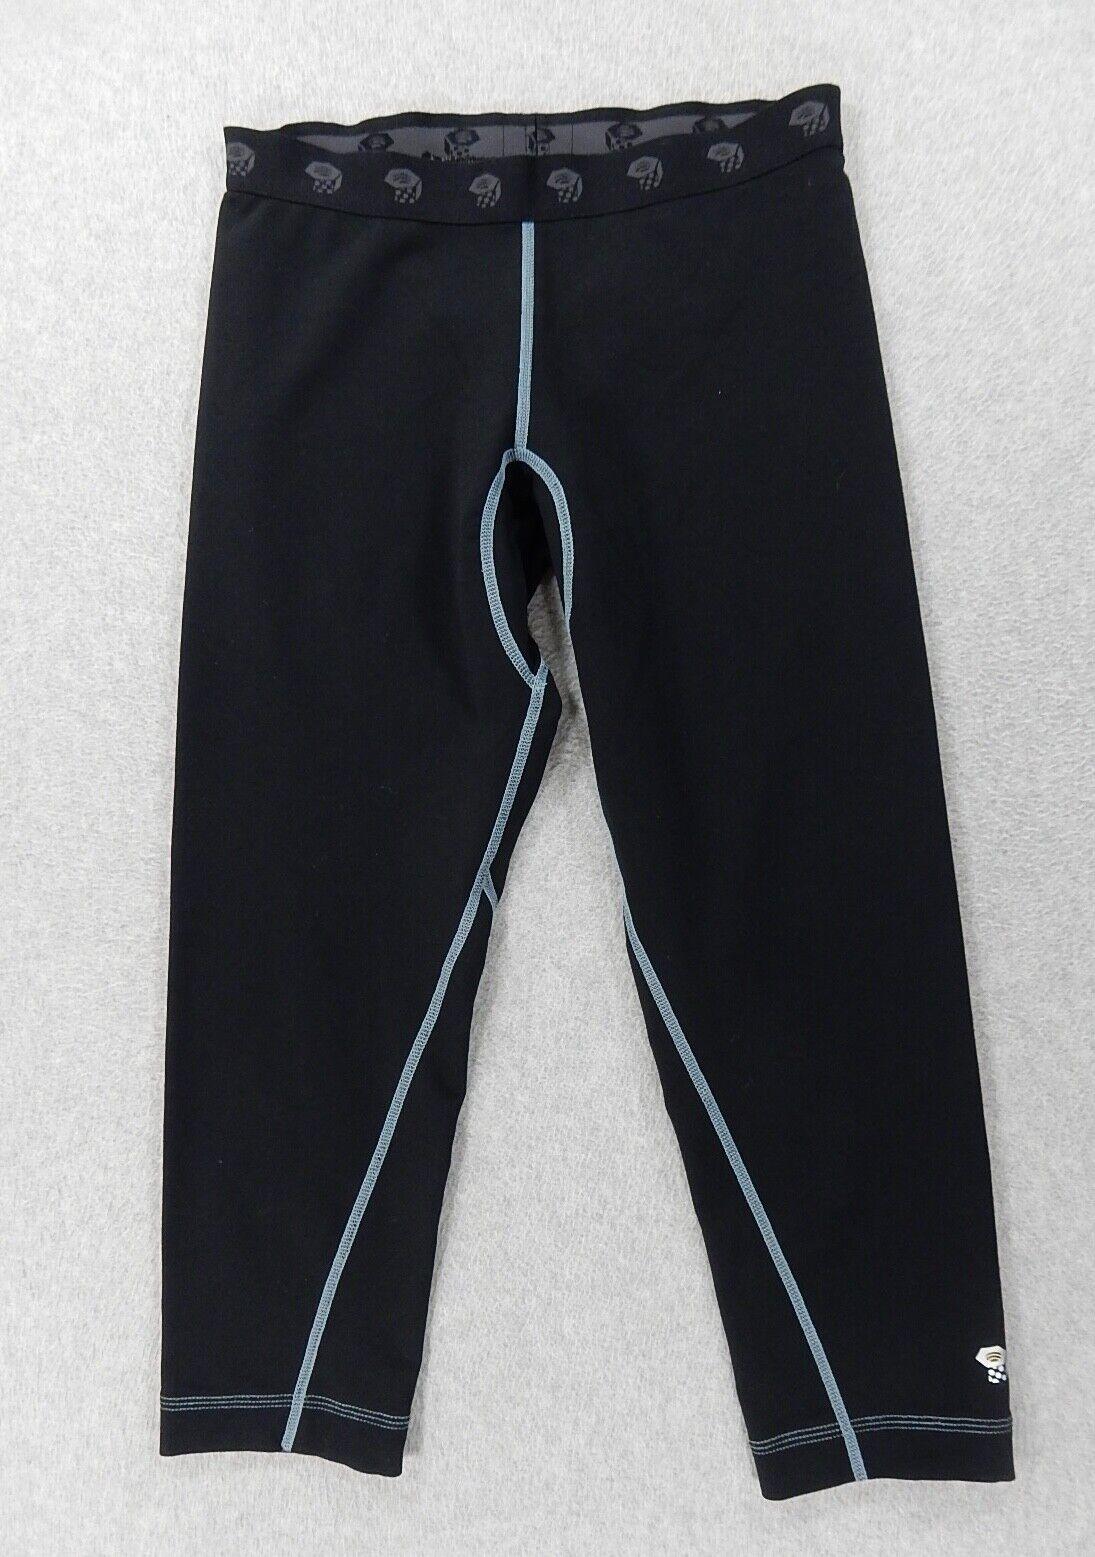 Mountain Hardwear Compression Base Layer Tights (Womens XS) Black